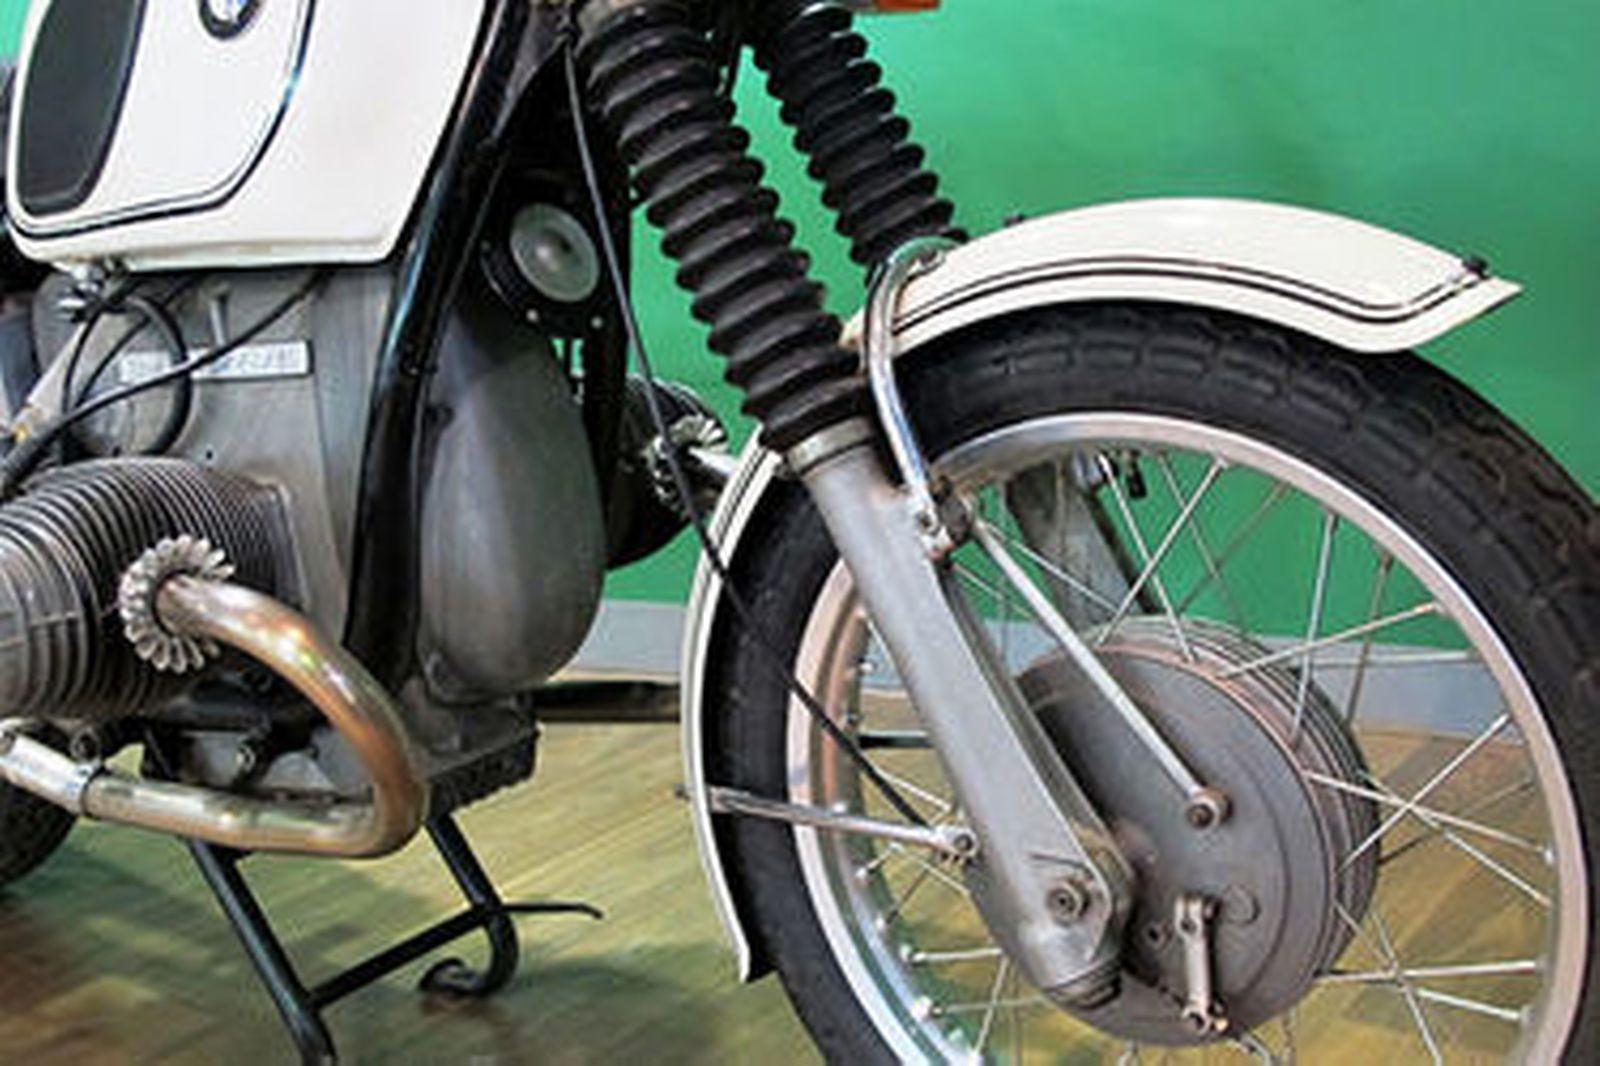 BMW R75/5 750cc Motorcycle